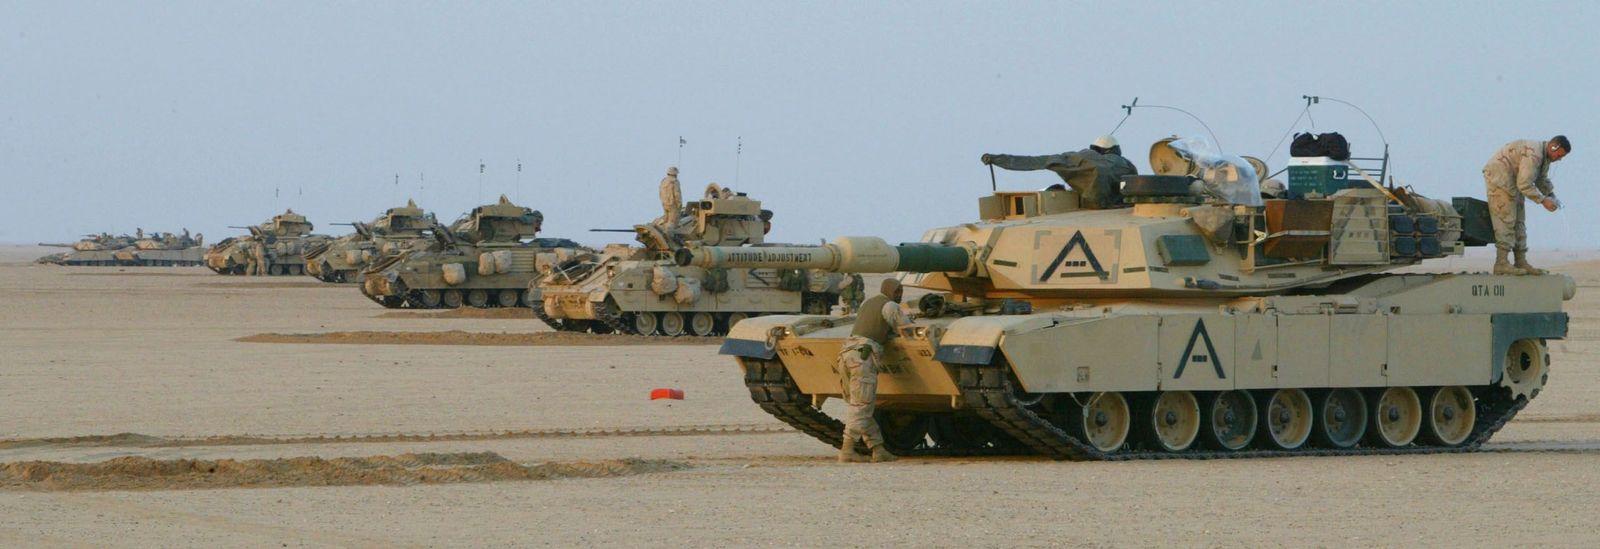 irak m1 panzer